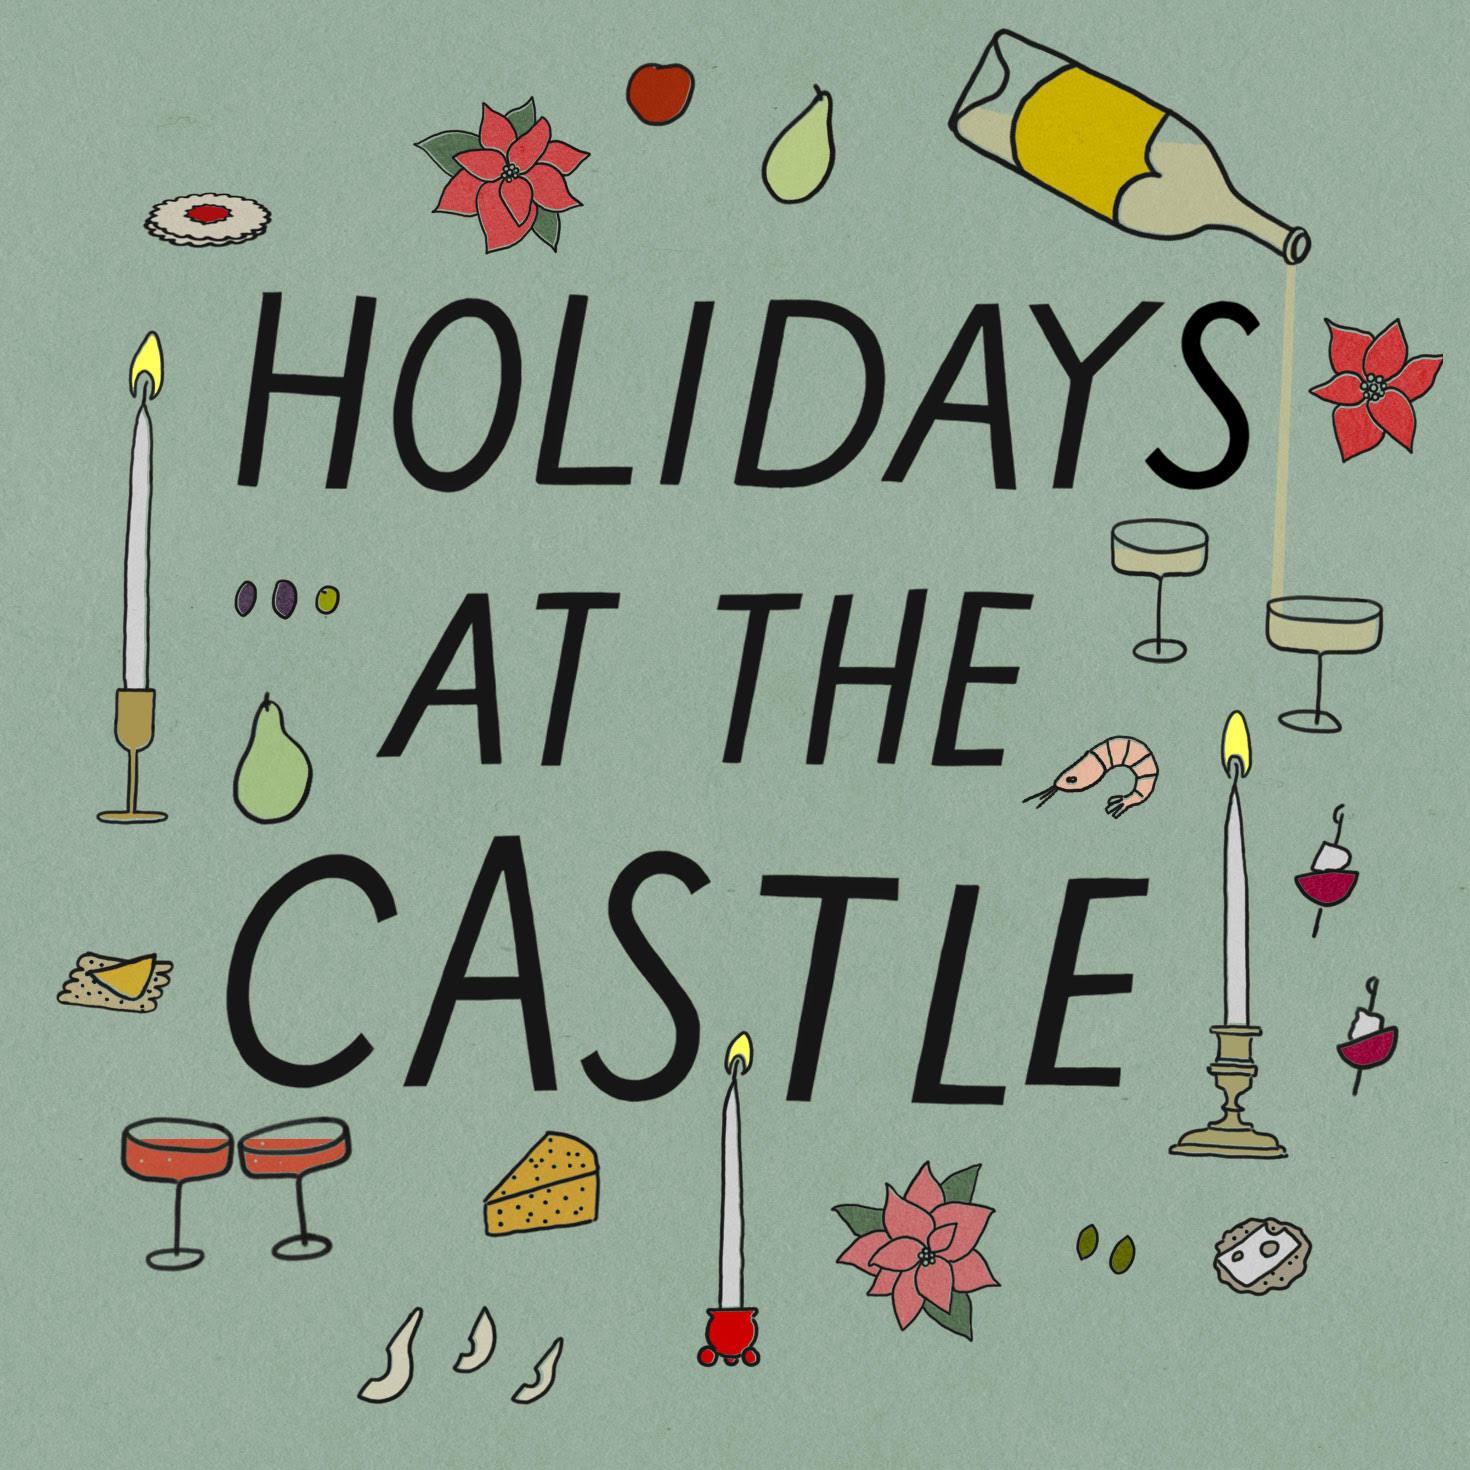 HolidaysAtTheCastle.jpg